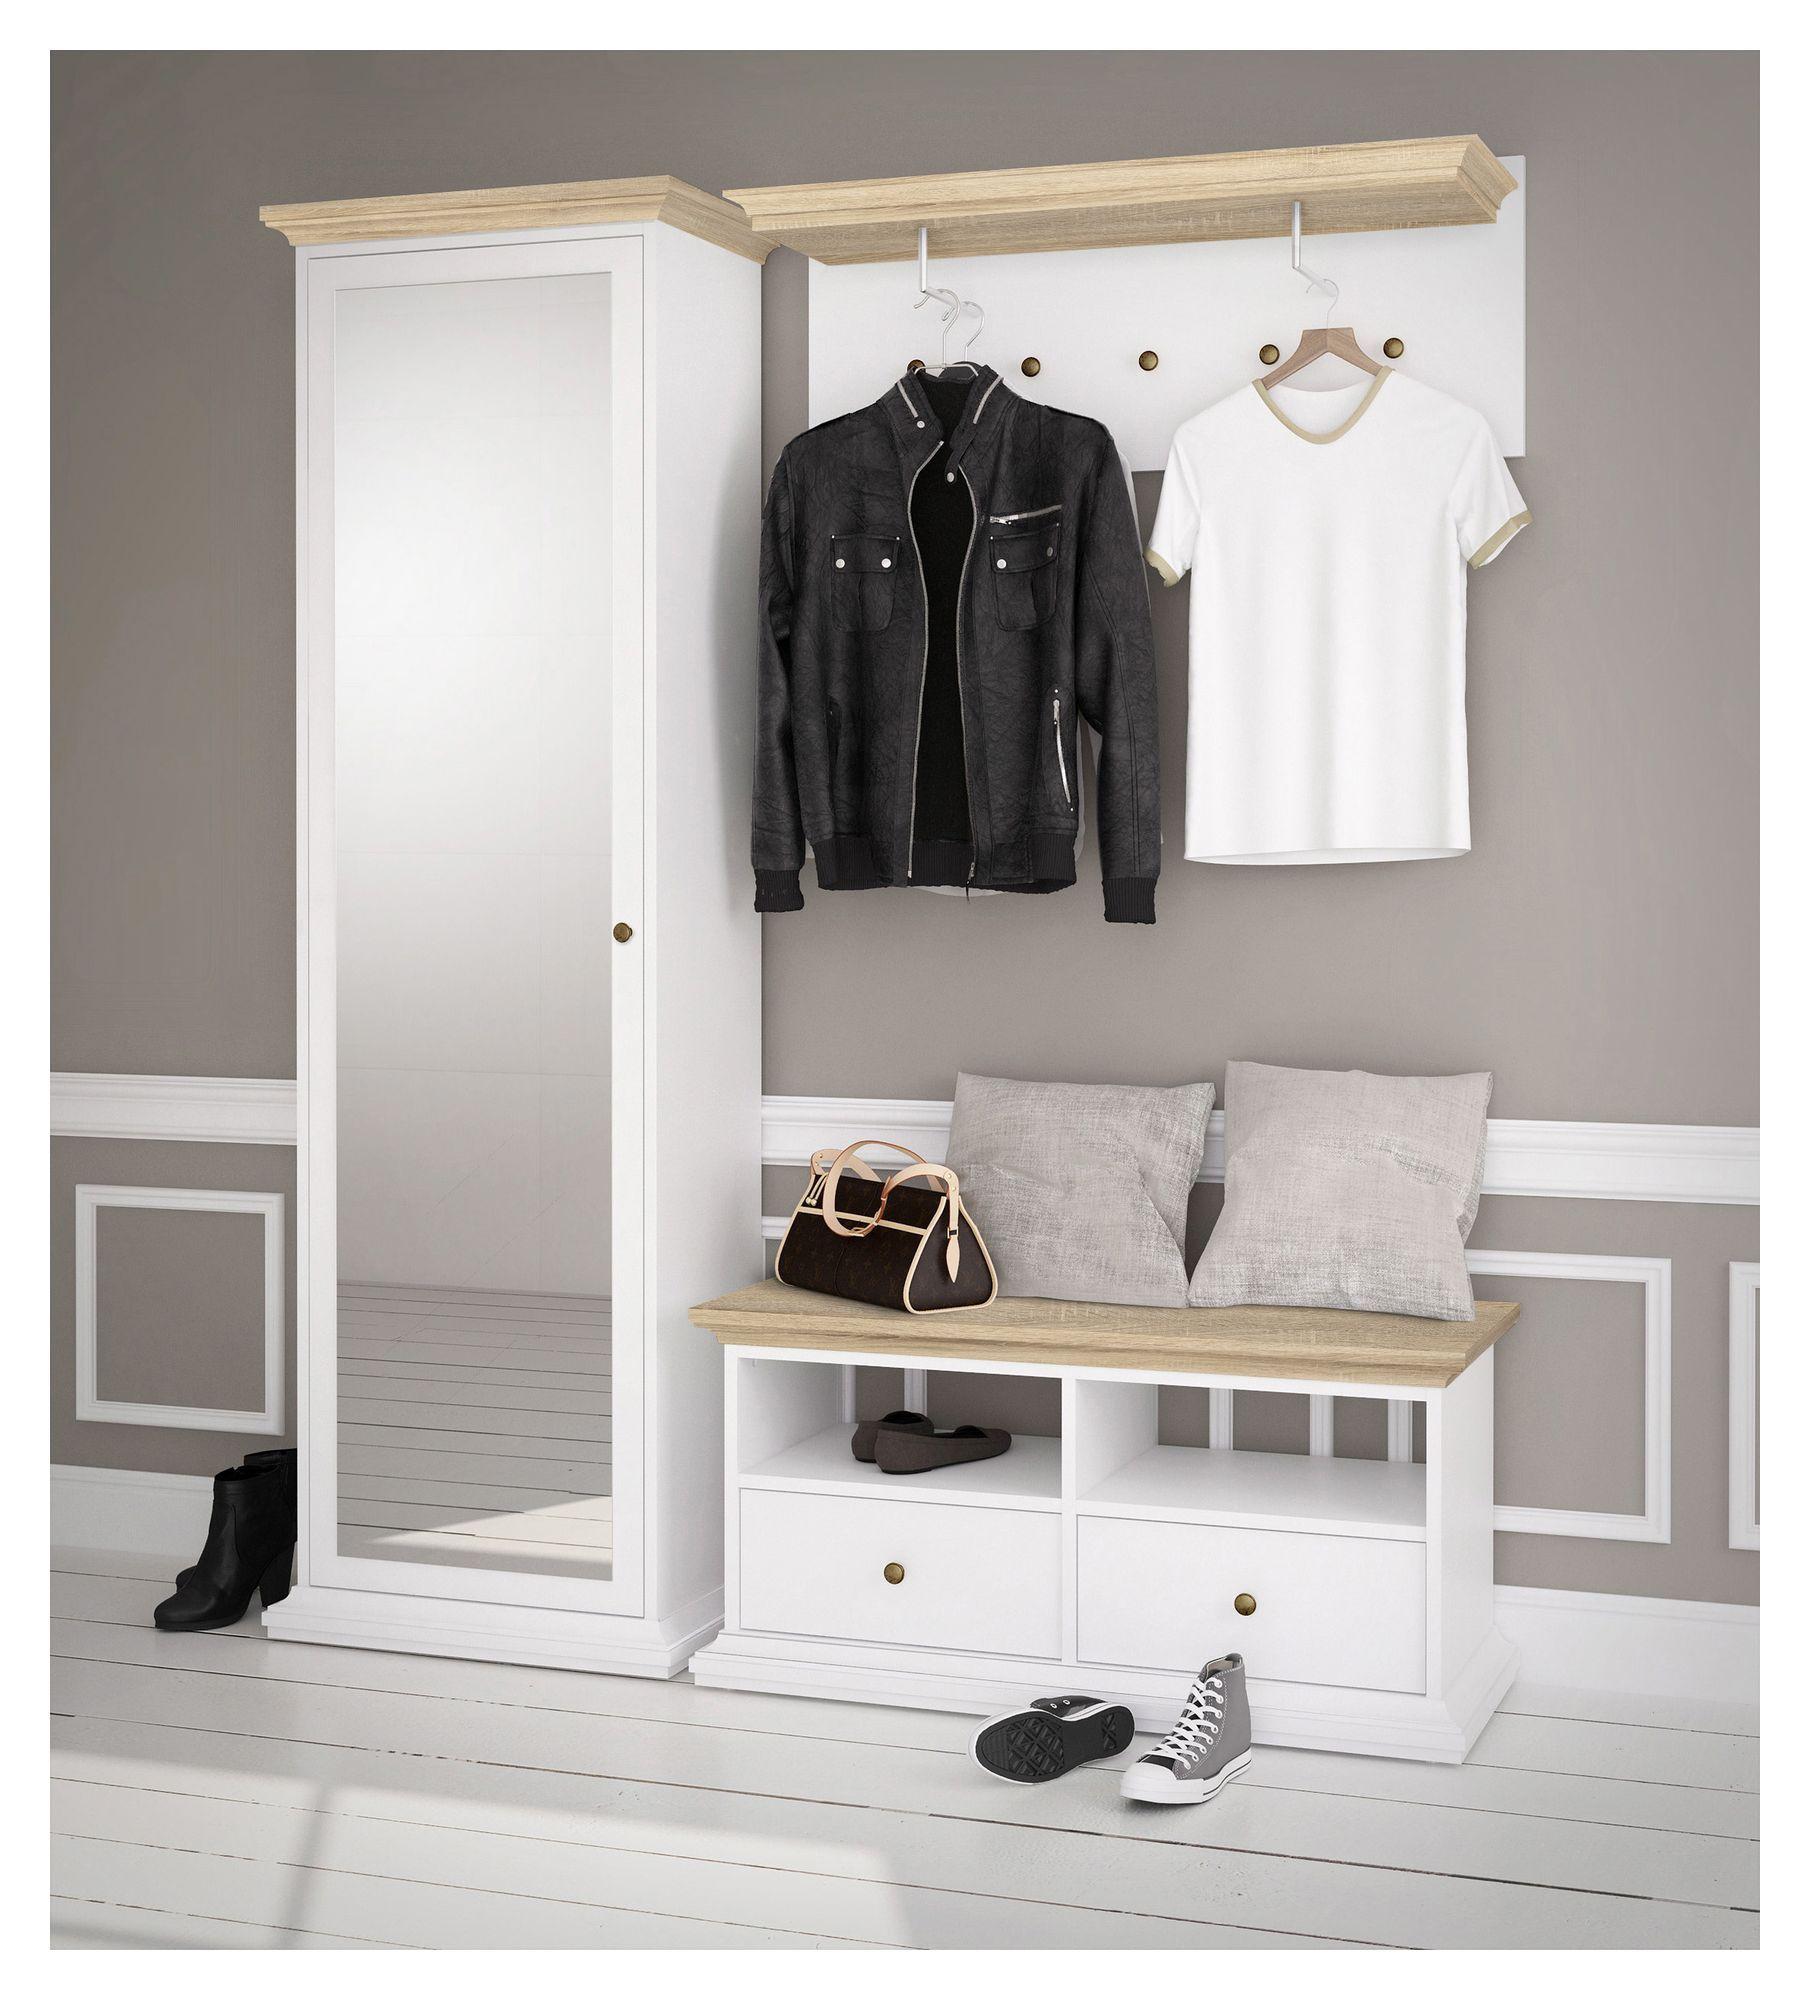 Paris Tvbord - Hvid/Lys træ B:102 - Hvidt TV-bord med 2 skuffer